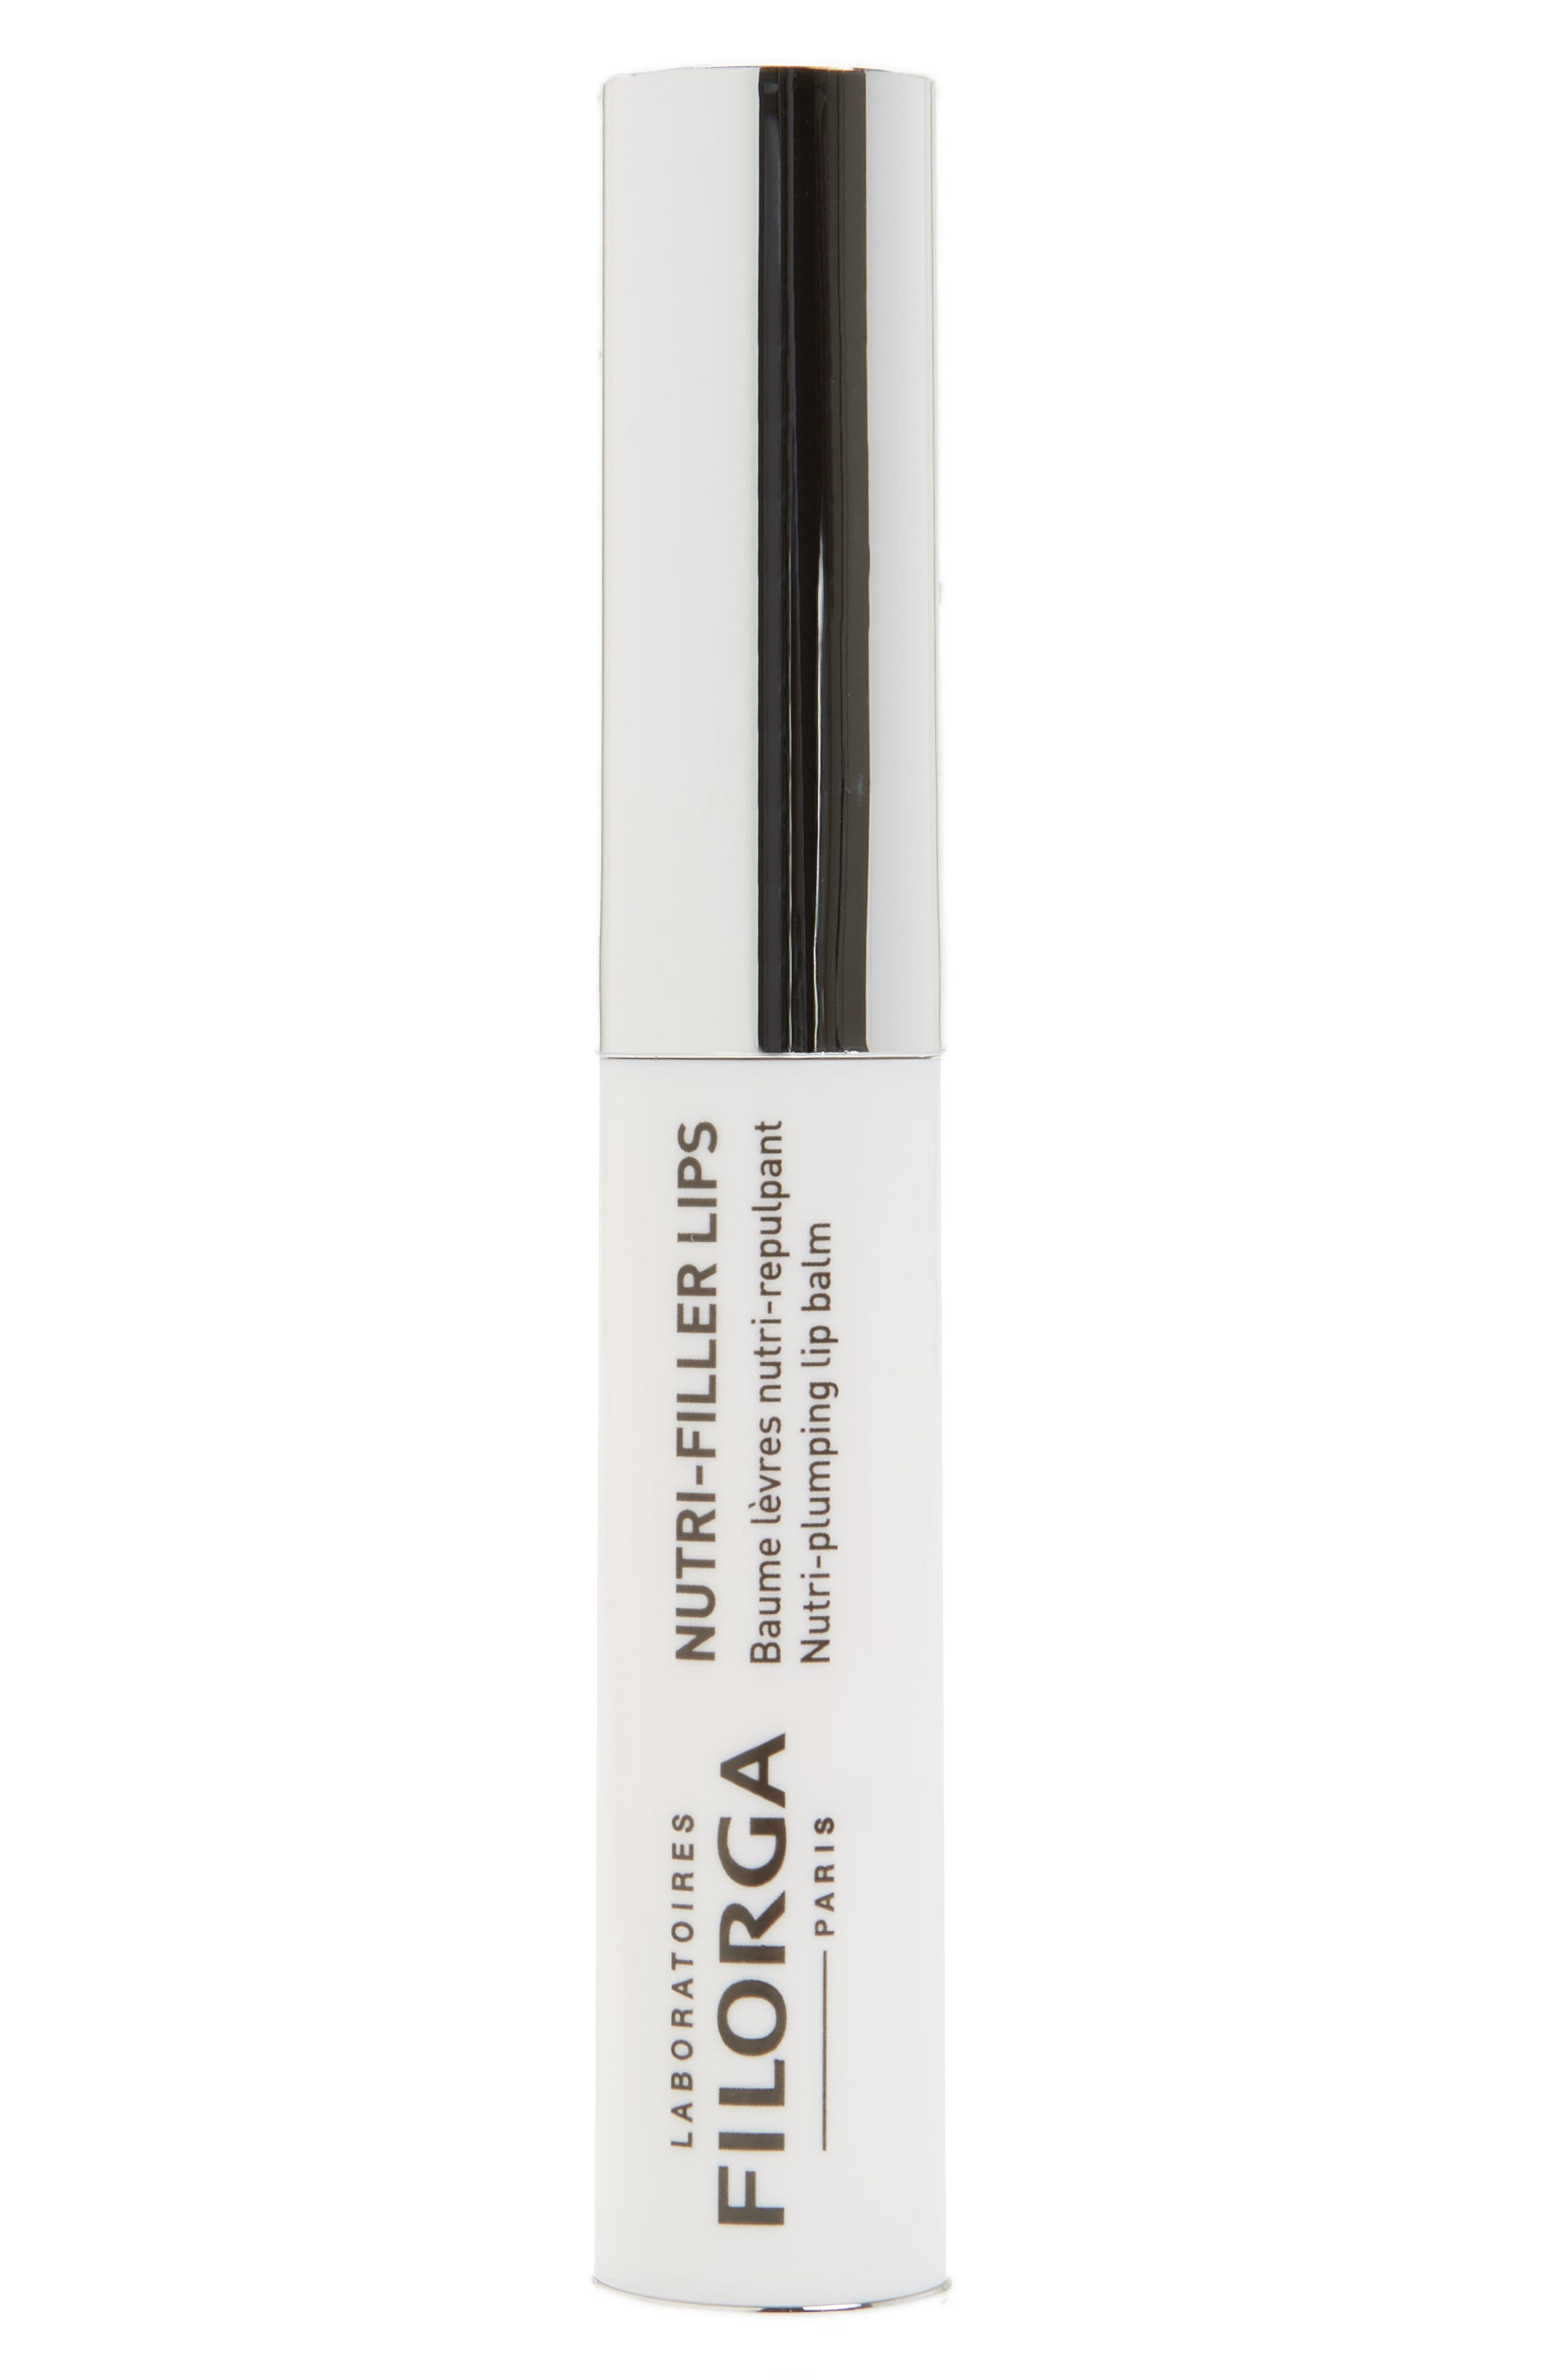 Main Image - Filorga Nutri-Filler Lips